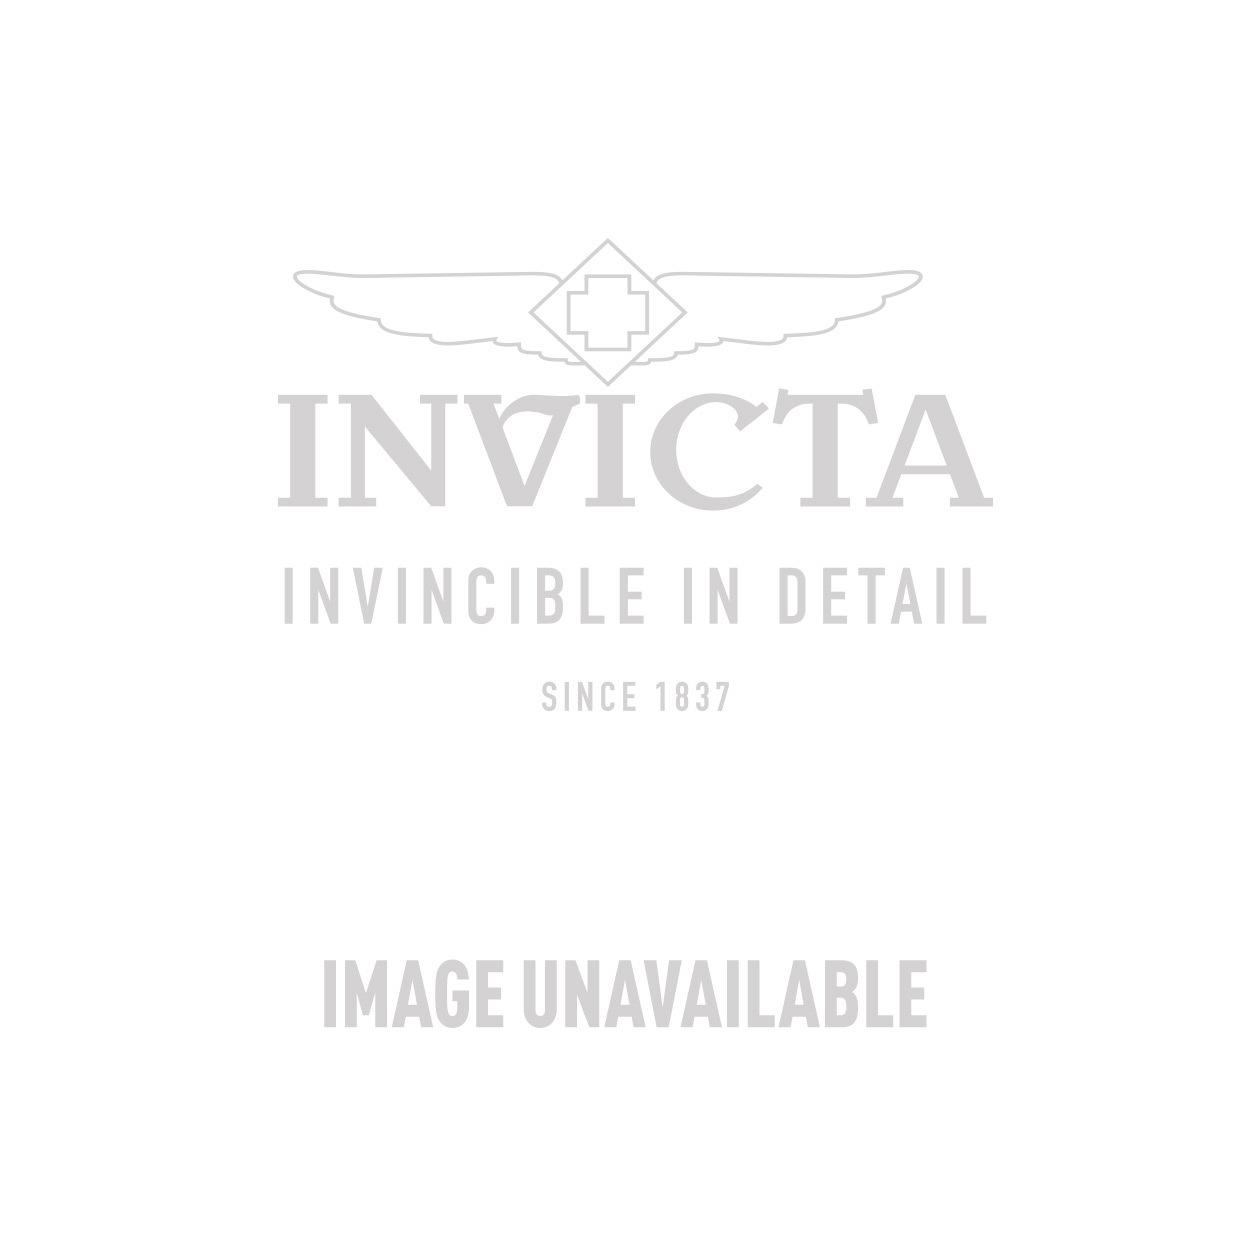 INVICTA Jewelry Divina Necklaces 50 18.4 Silver 925 Yellow Gold - Model J0030